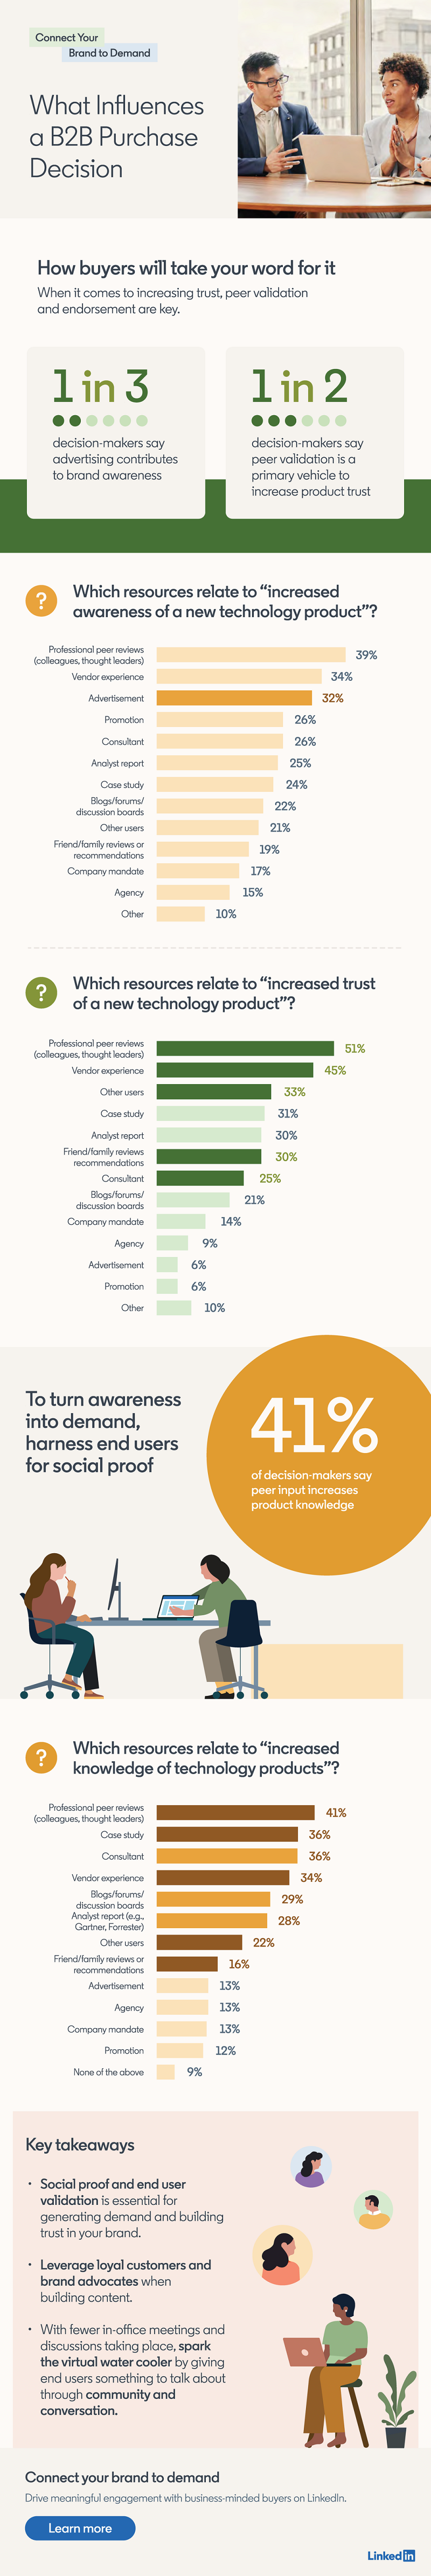 LinkedIn B2B purchase decisions infographic